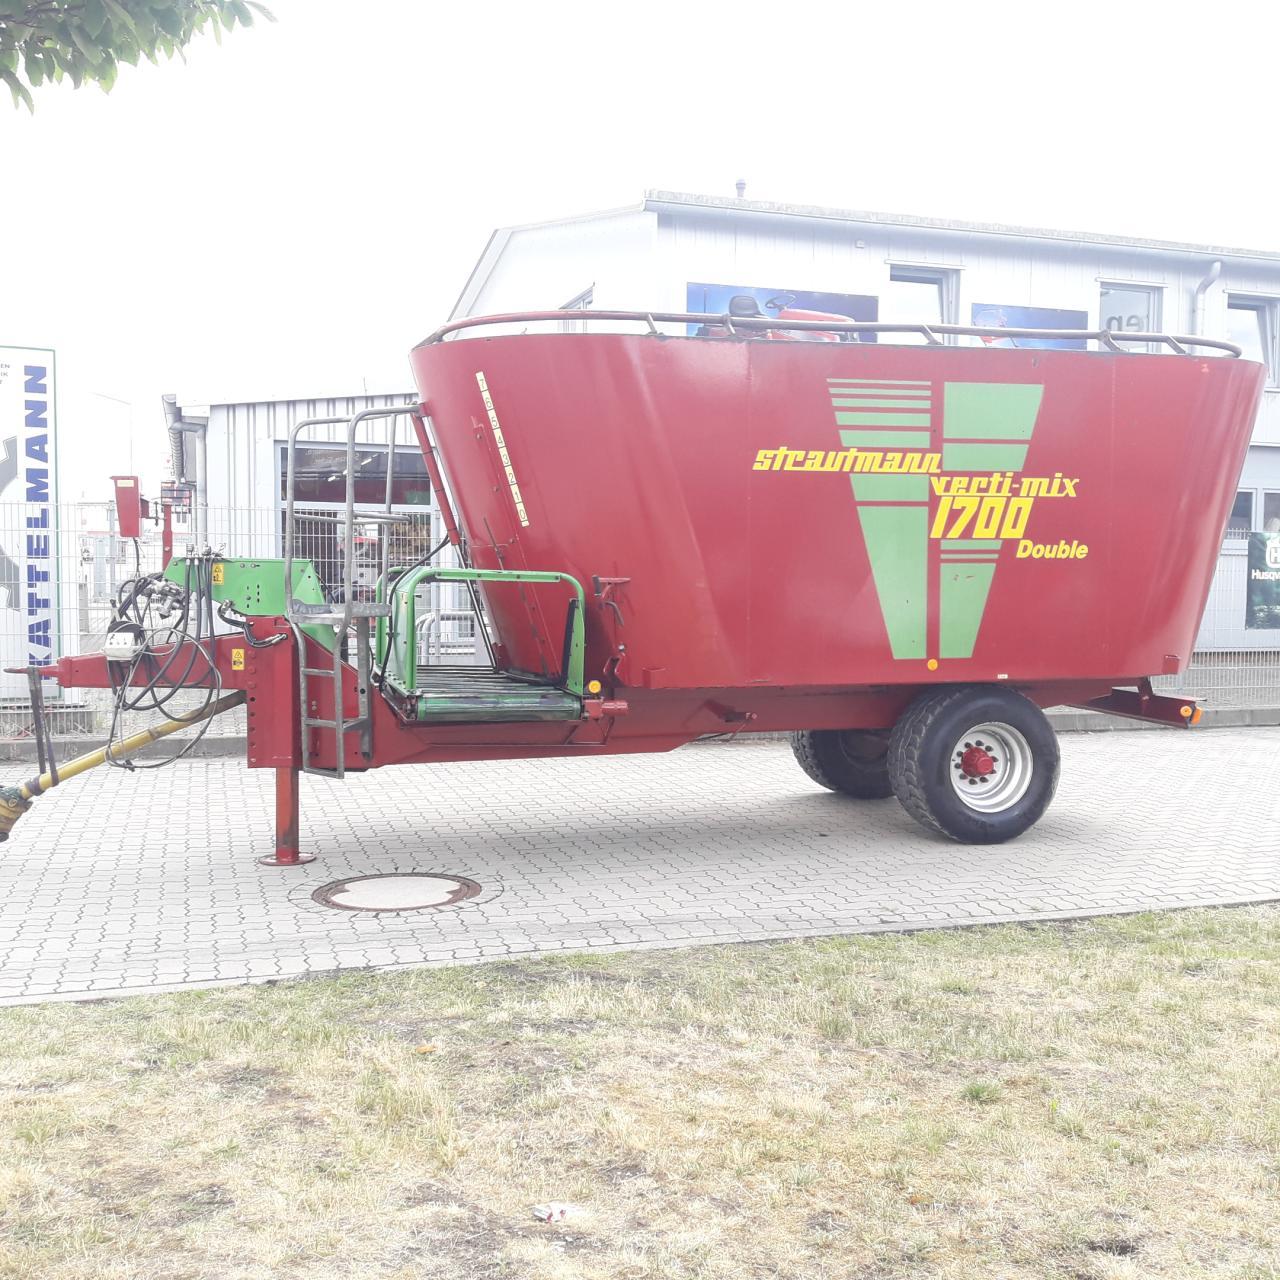 Strautmann Verti-mix 1700 Double